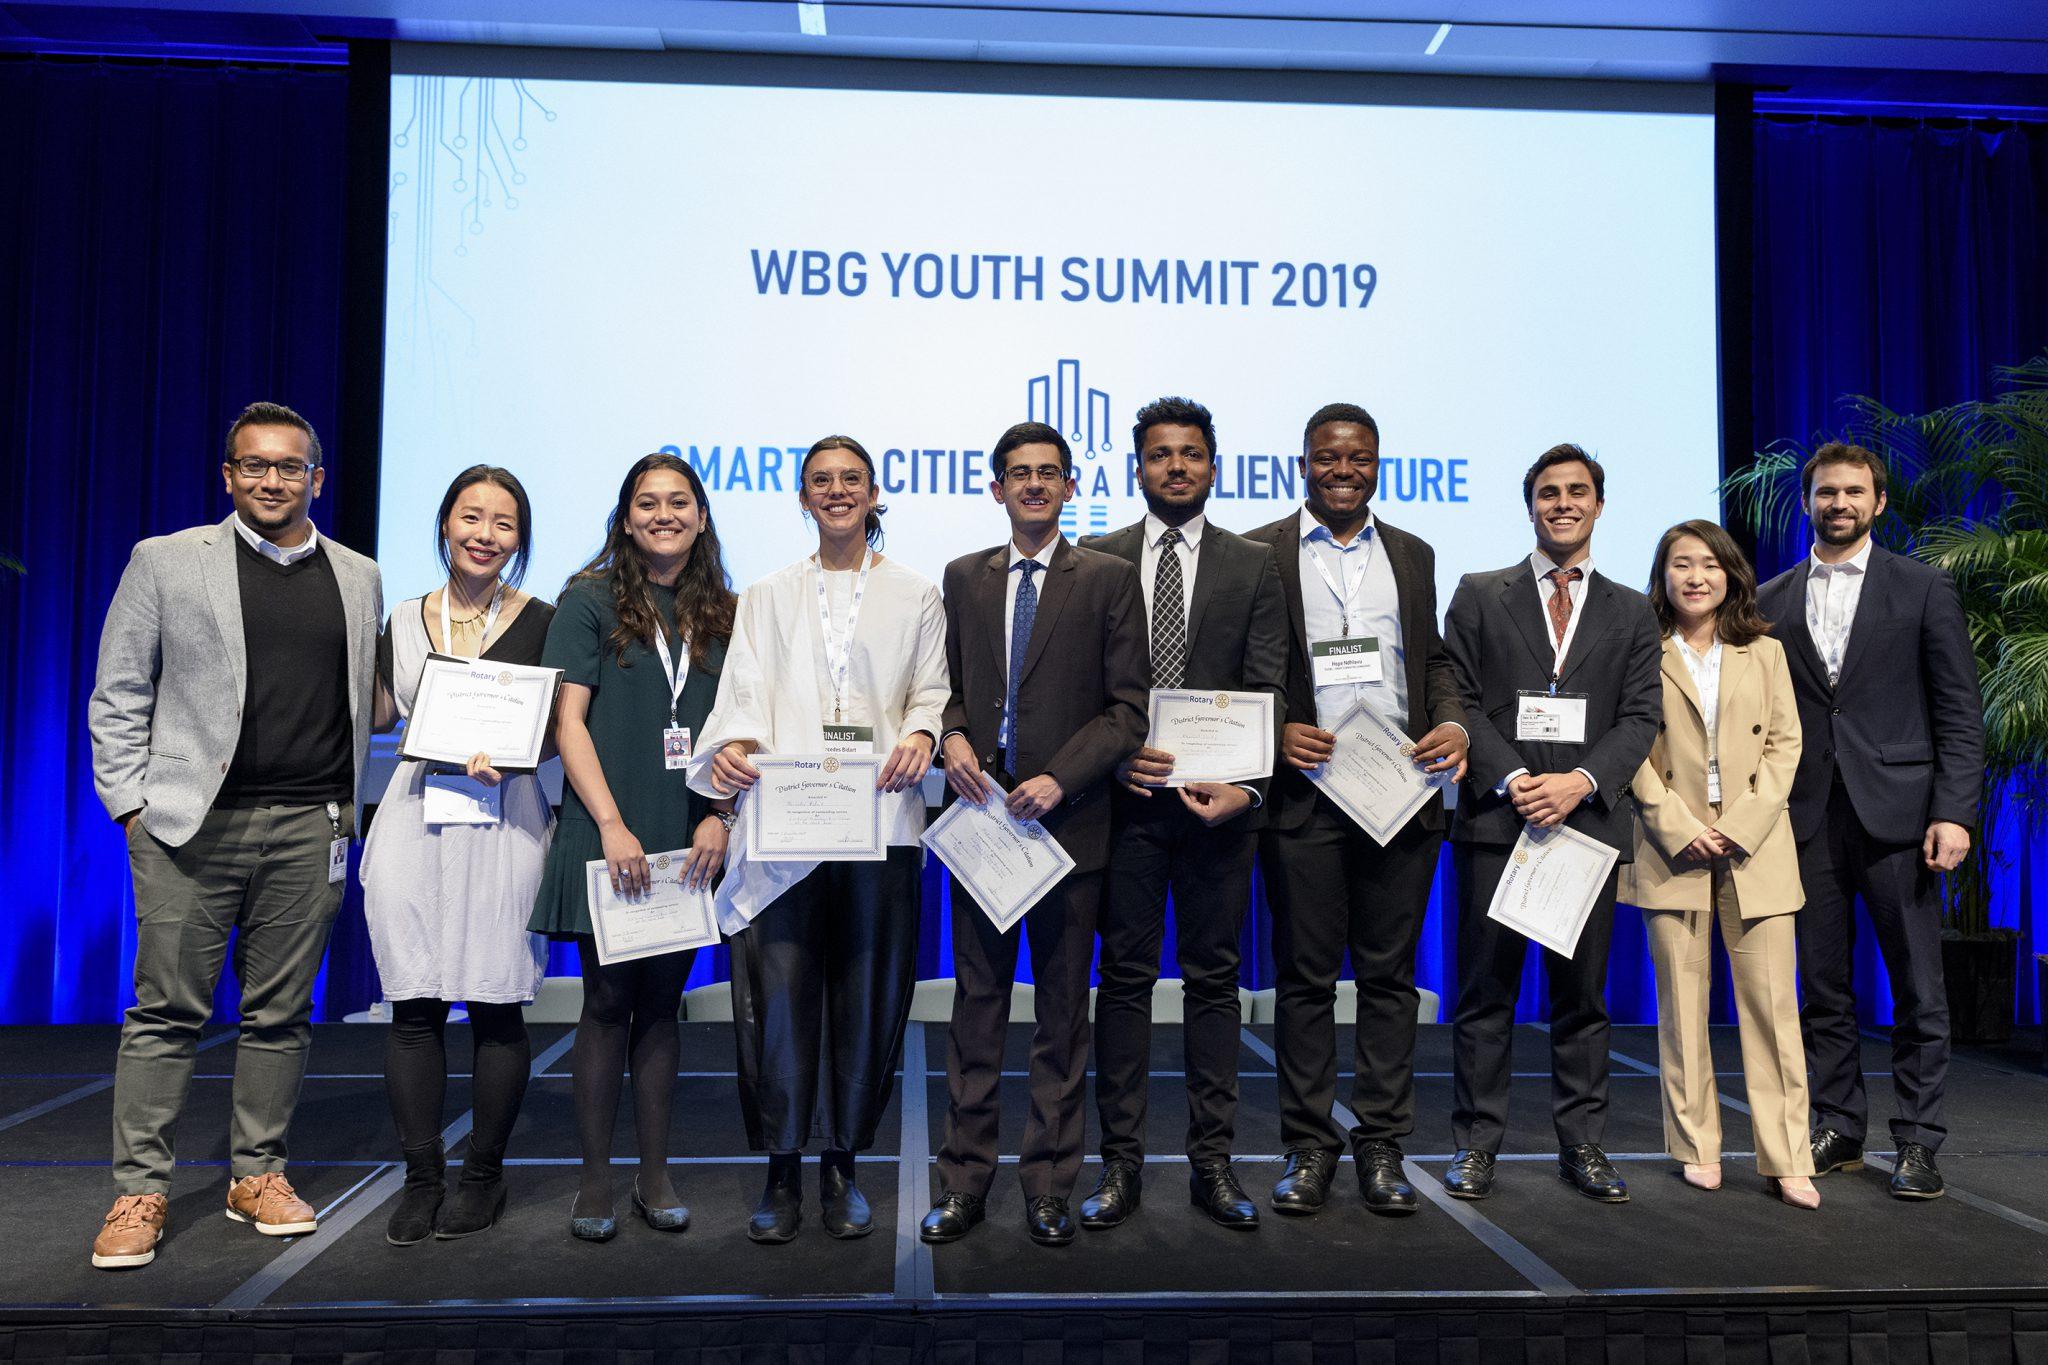 World Bank Youth Summit Award Ceremony Competitors